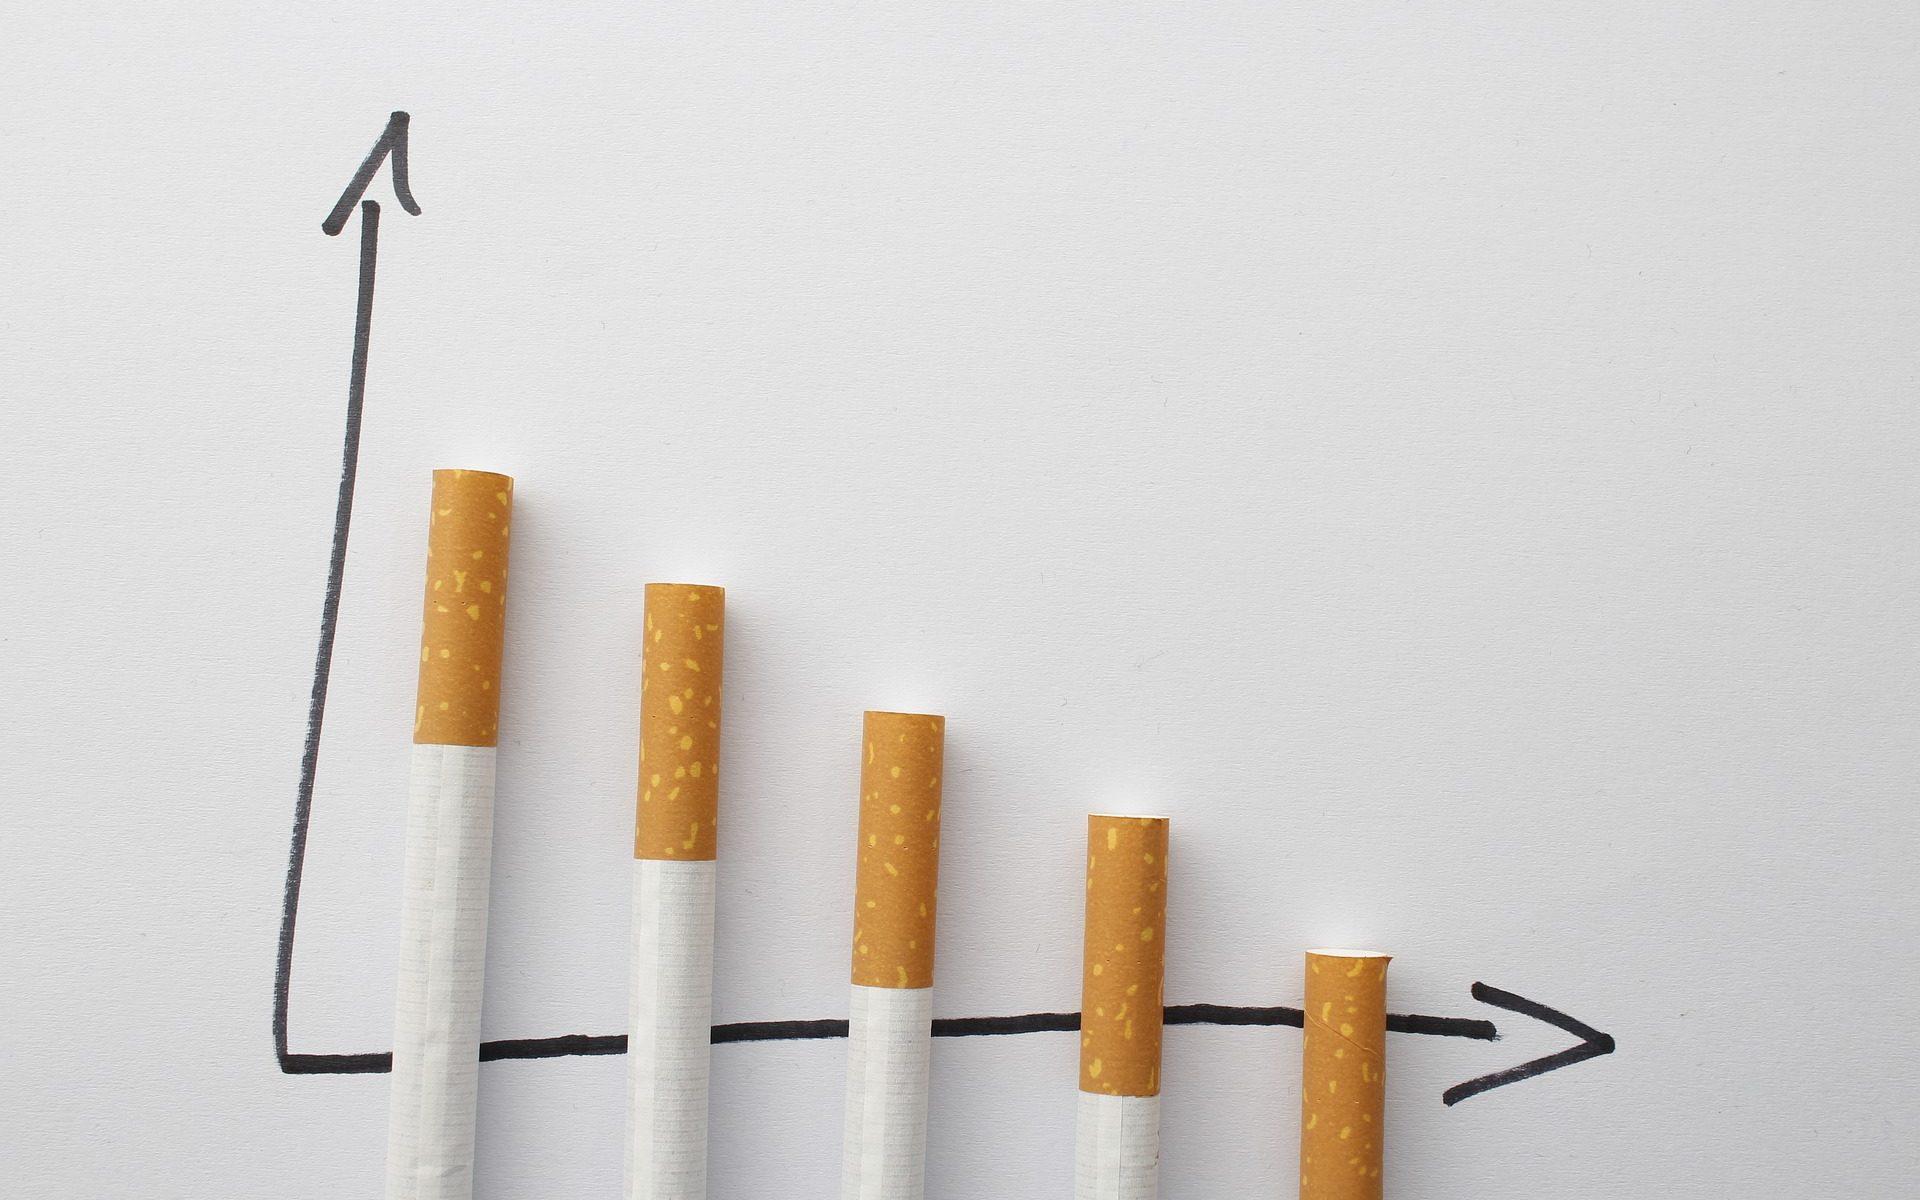 Elektrische Zigarettenstopfmaschinen immer beliebter auf men-styling.de